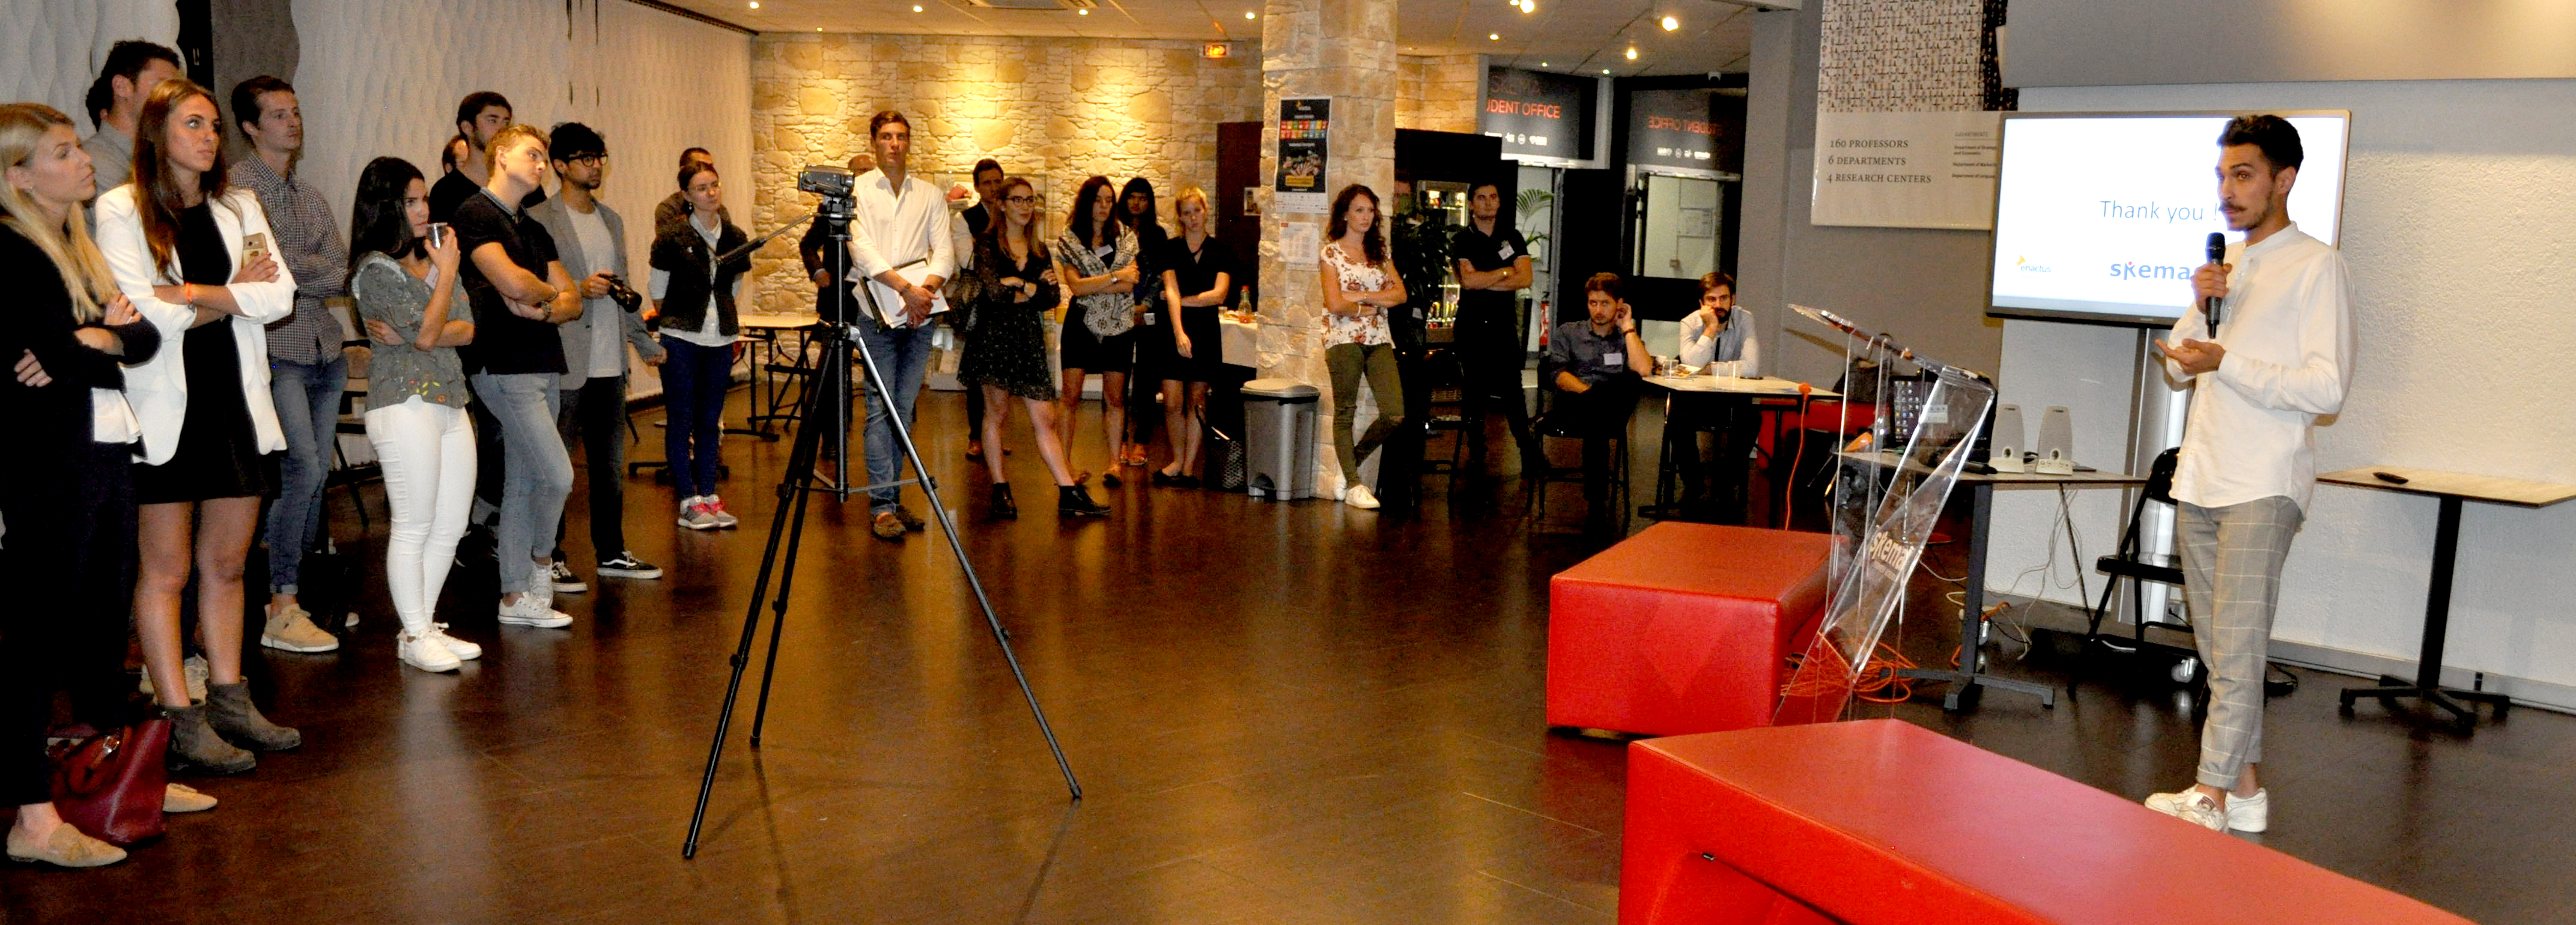 Startup Kafe-SKEMA Ventures-Sophia